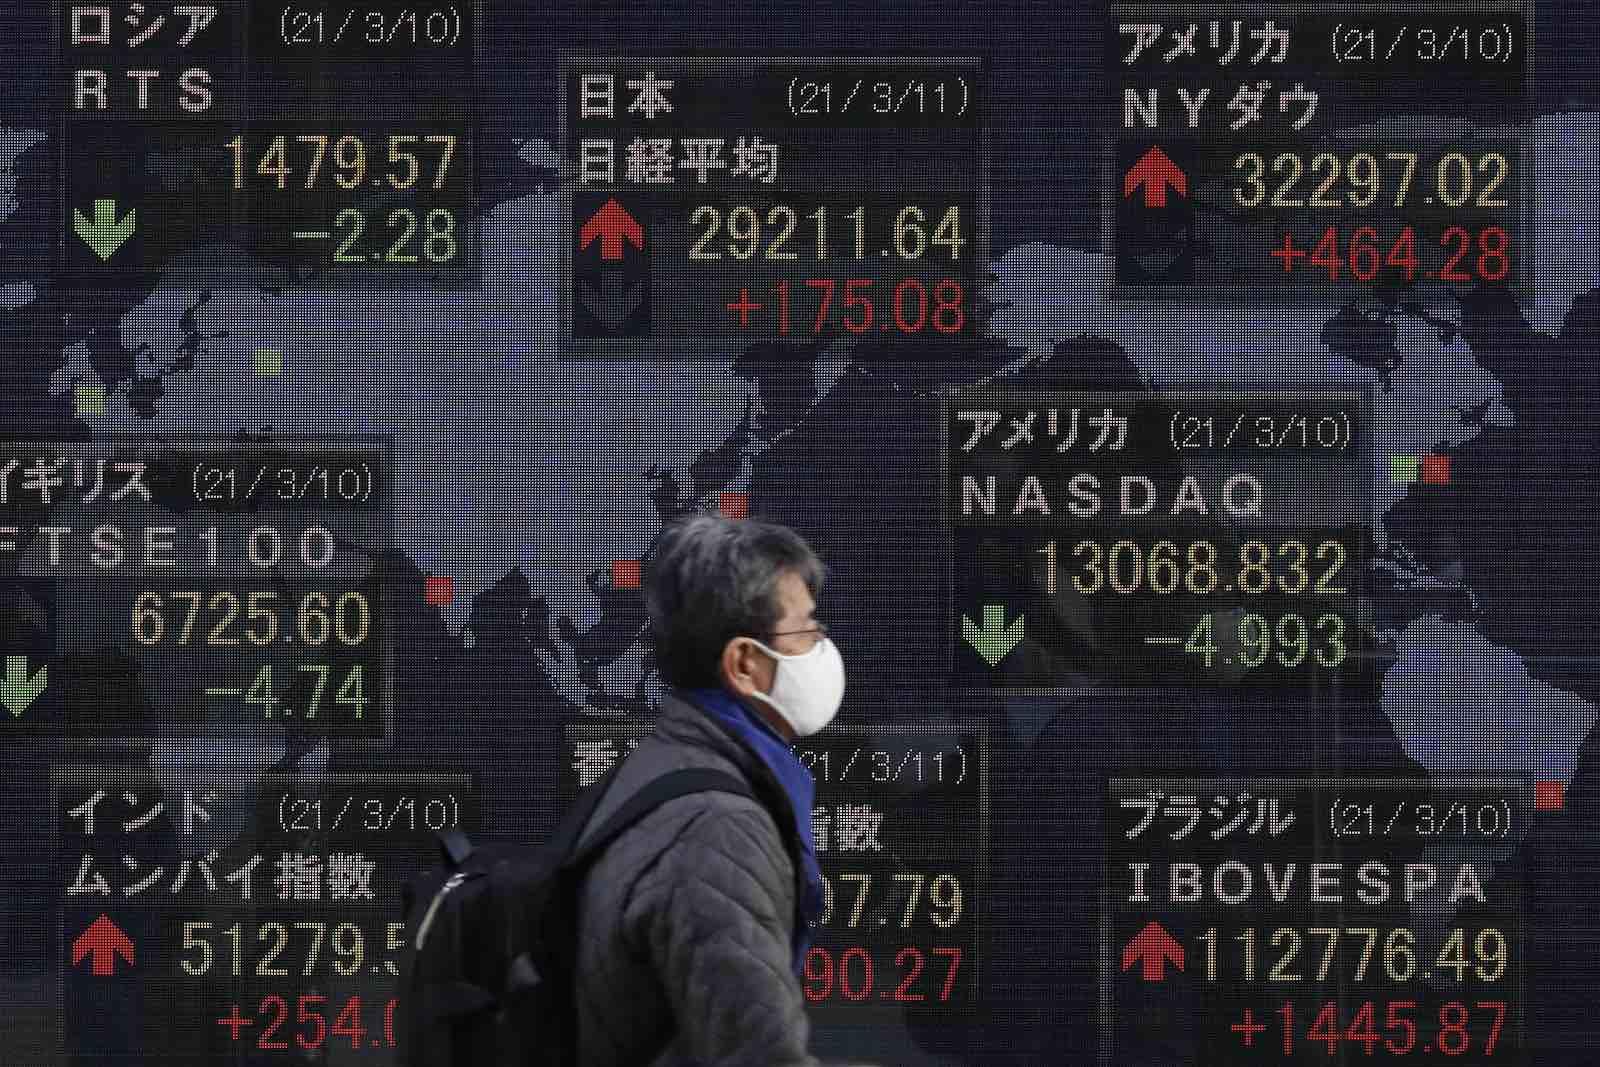 Global stock exchange updates on display in Tokyo, 11 March 2021 (James Matsumoto/SOPA Images/LightRocket via Getty Images)